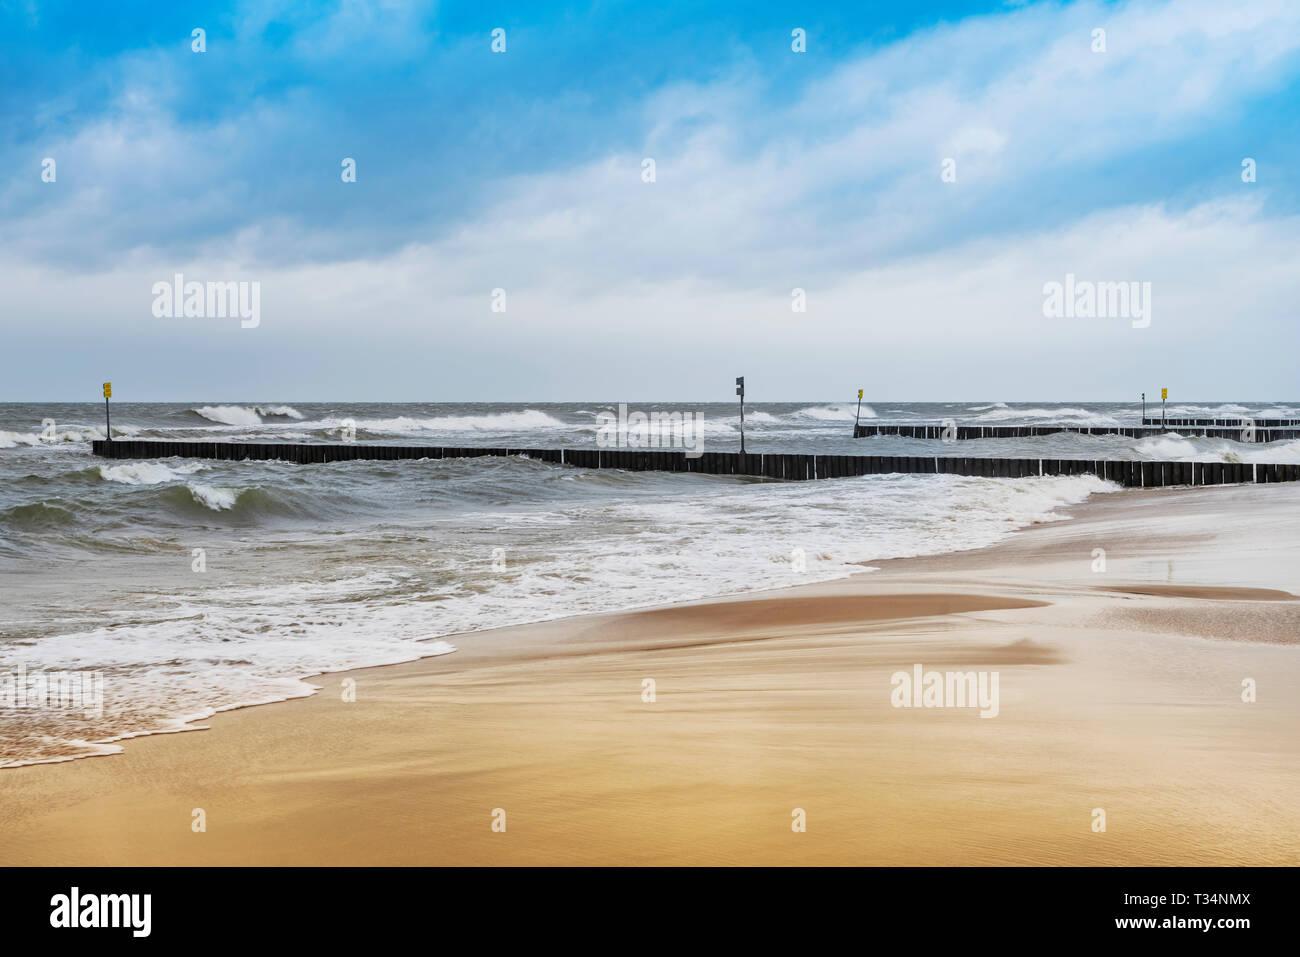 Sandy Beach with groynes on the Baltic Sea, Kolobrzeg, West Pomeranian, Poland, Europe - Stock Image